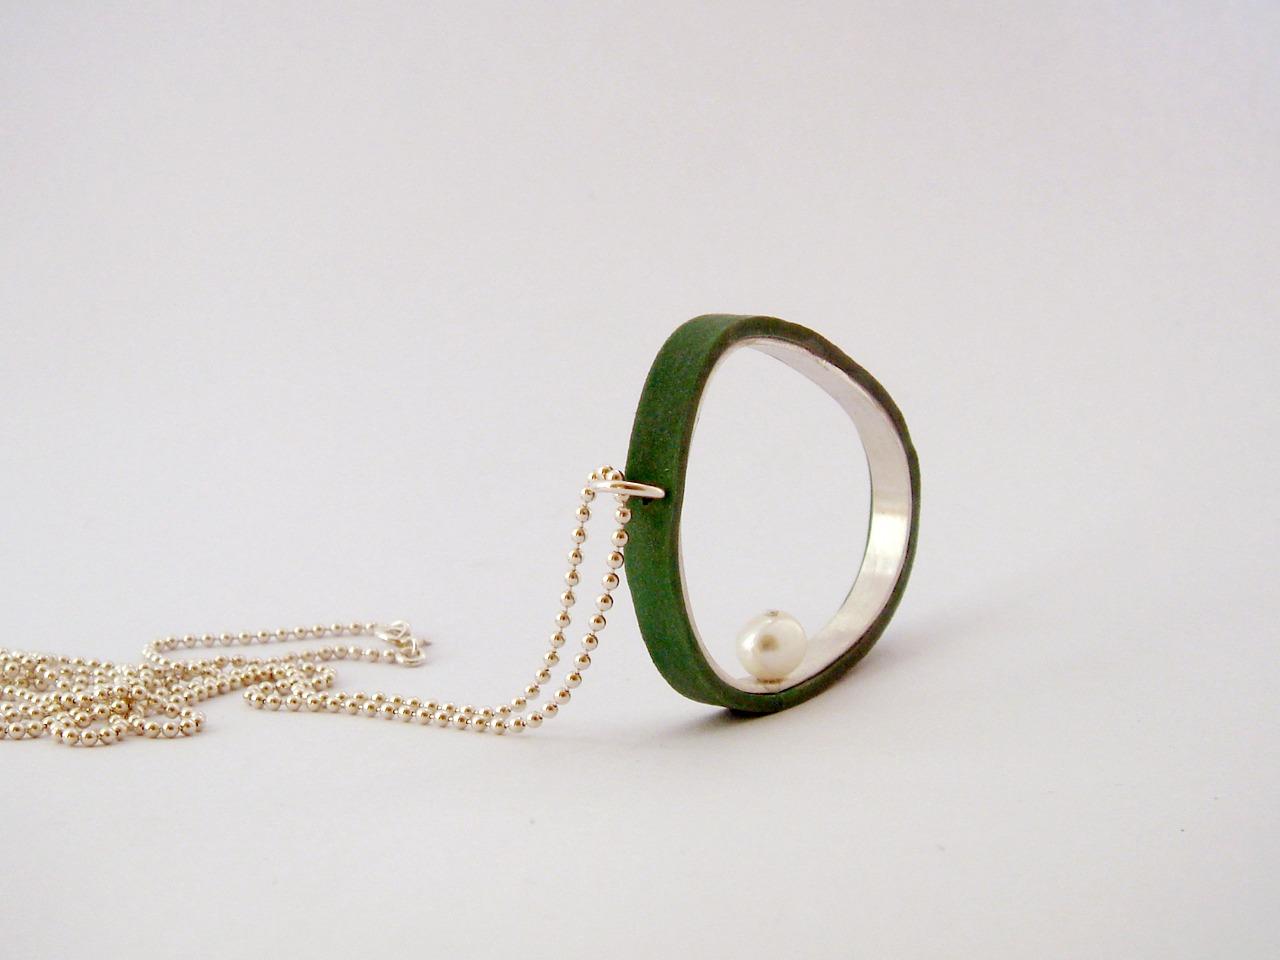 Collar verde-Susana Teixeira-plata de ley,caucho y perla